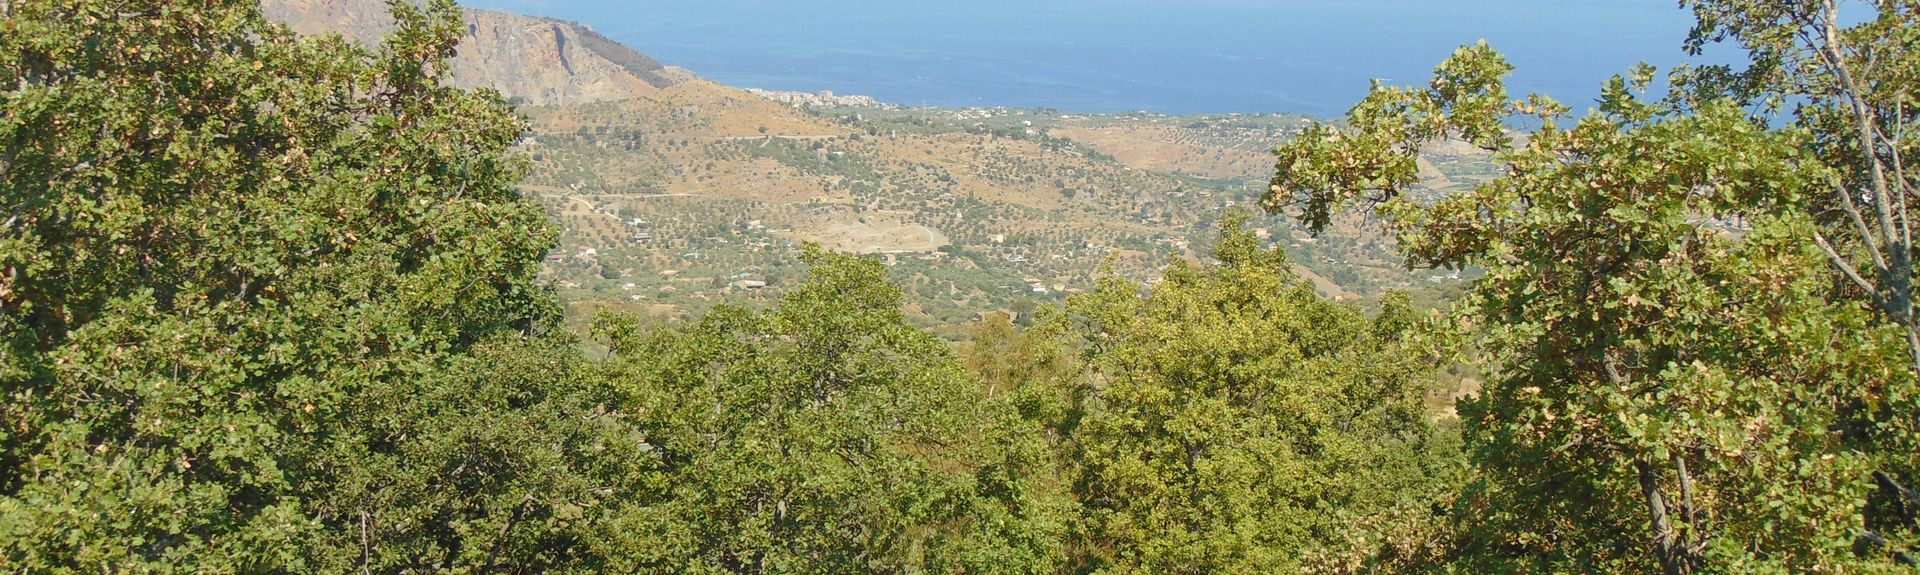 Alia, Palermo, Sicily, Italy